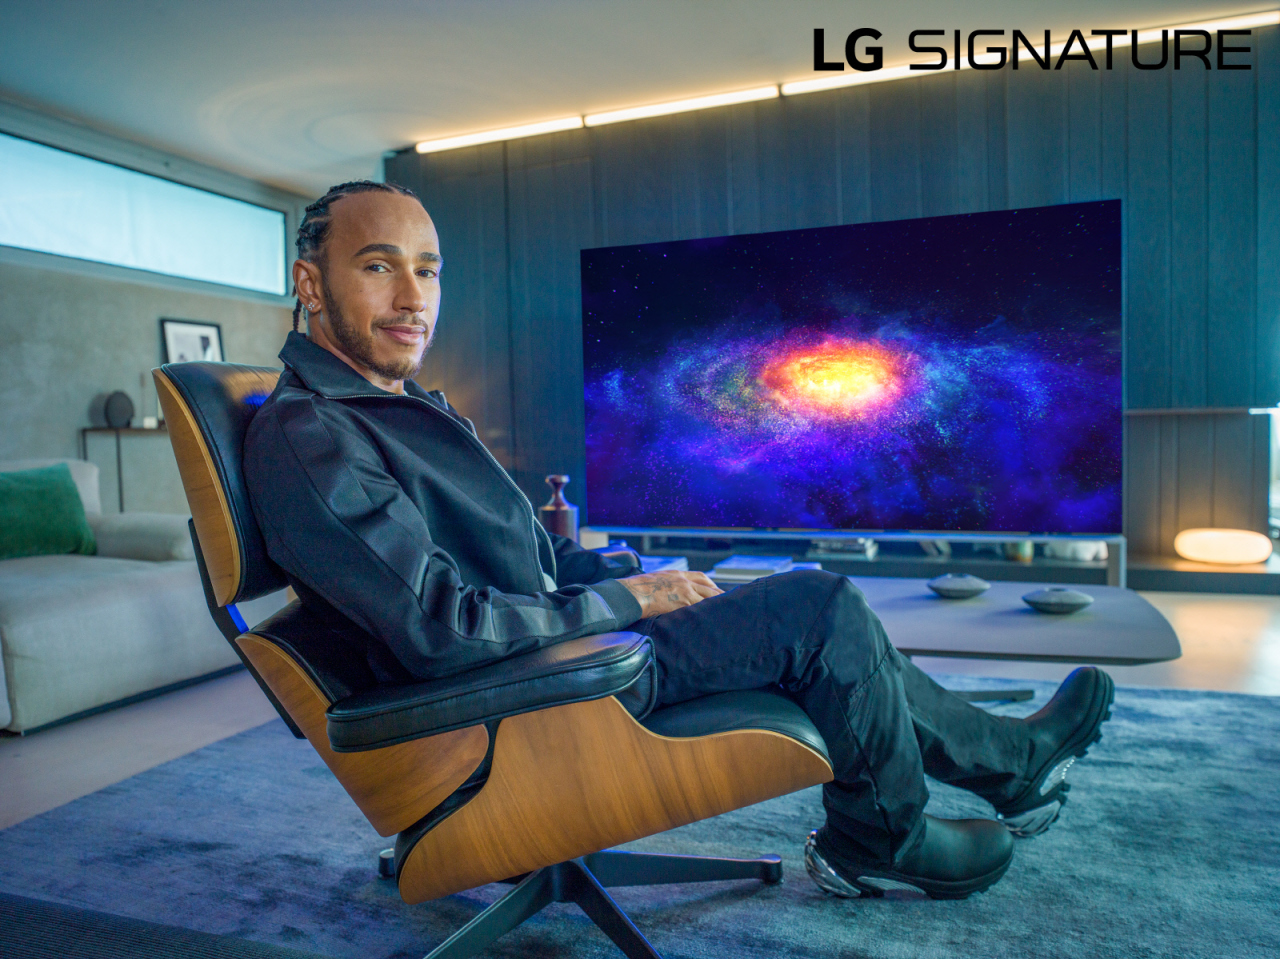 LG signs F1 Champ Lewis Hamilton as Ambassador of LG Signature